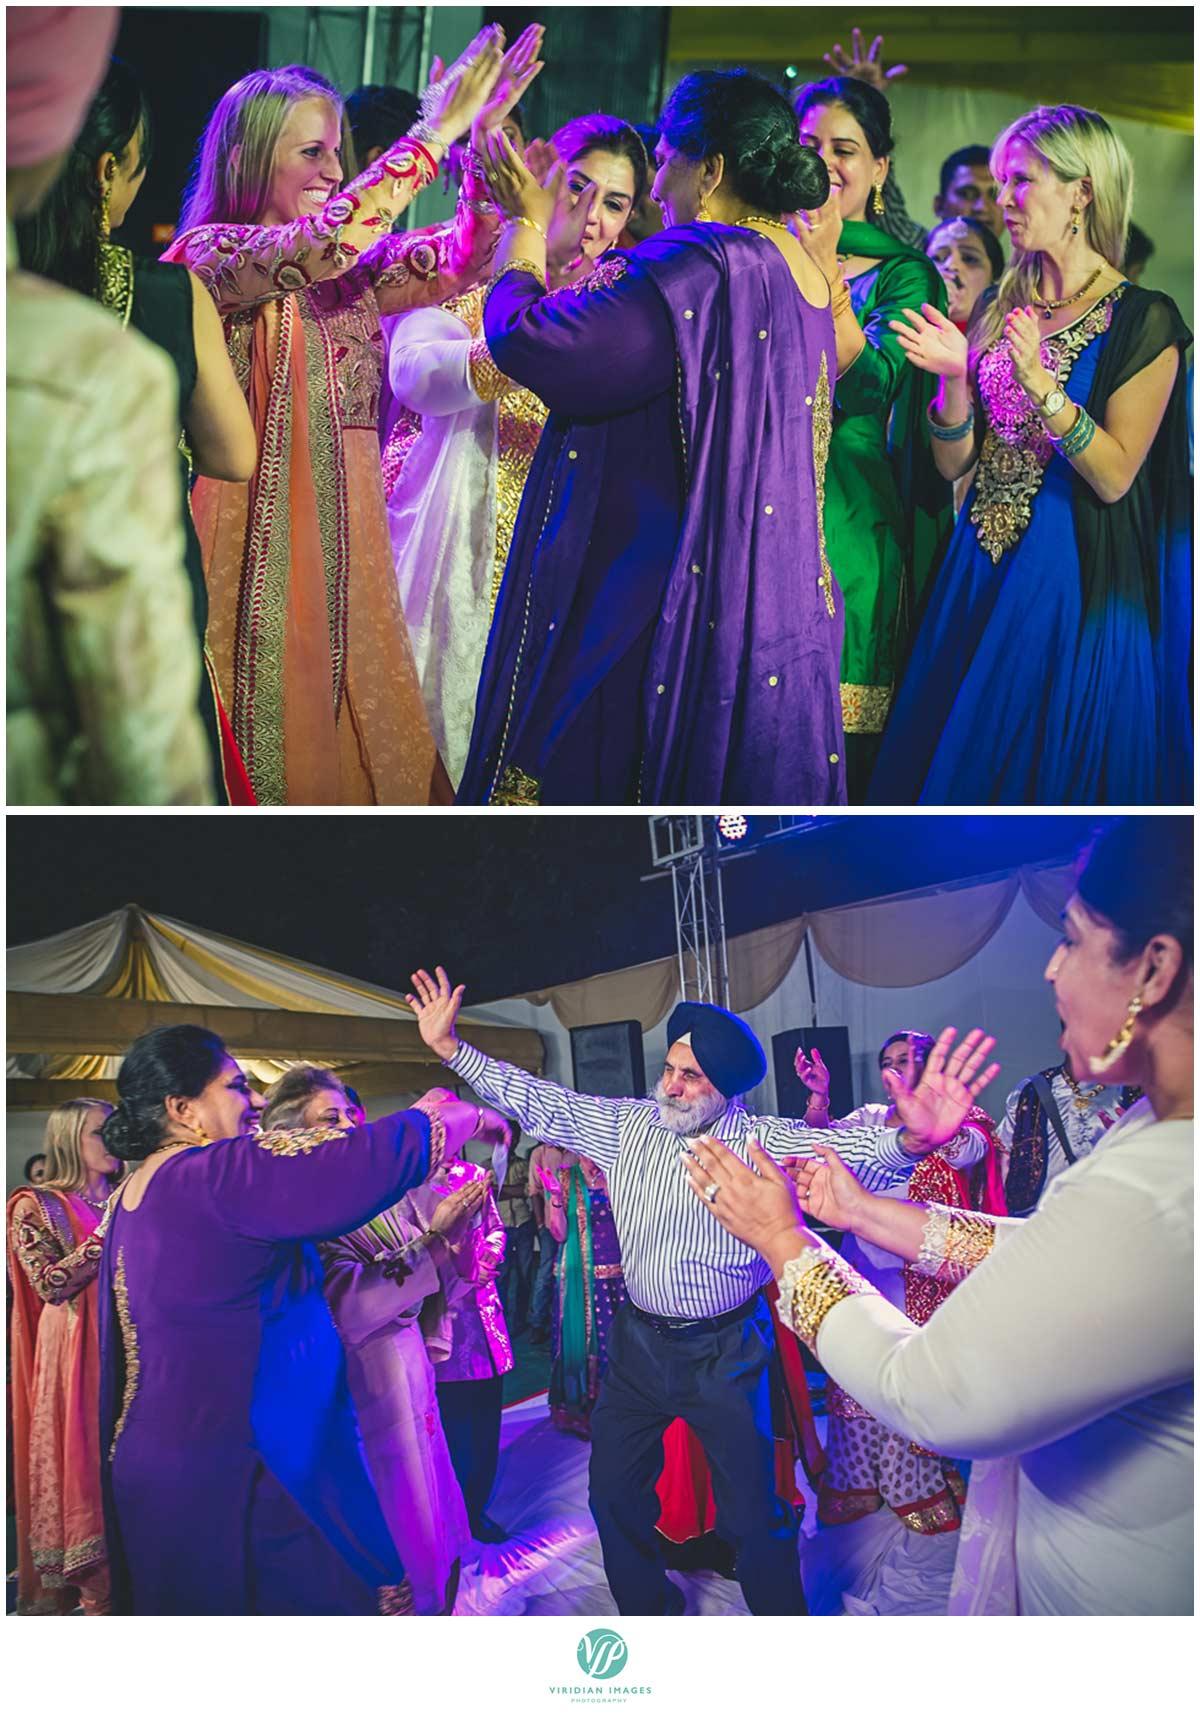 India_Chandigarh_Sangeet_Viridian_Images_Photography_poto_4